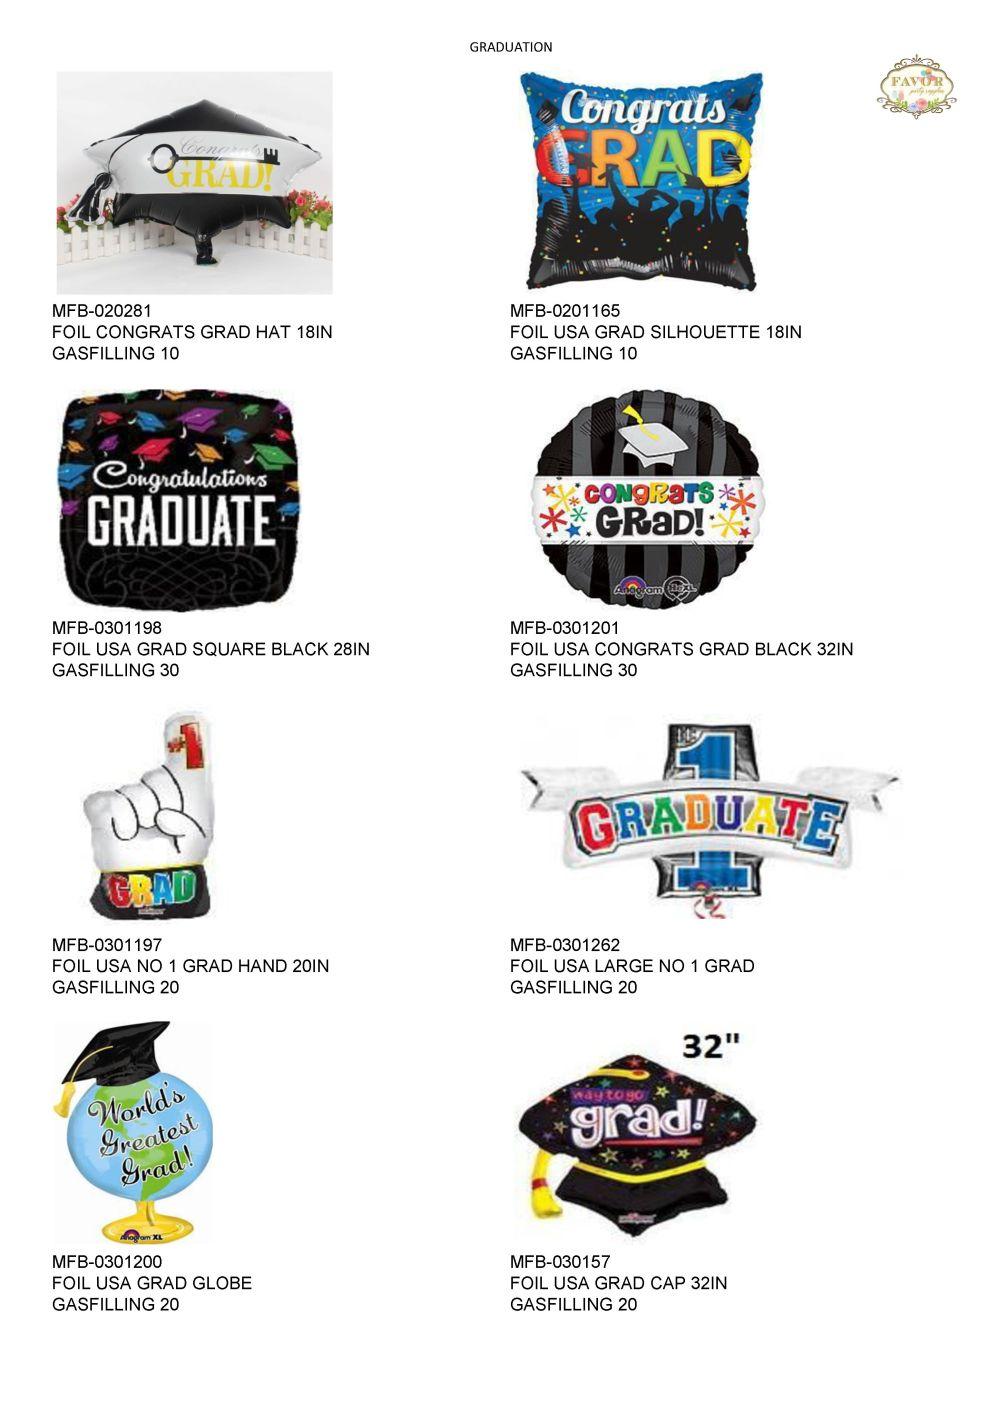 katalog-graduation_3